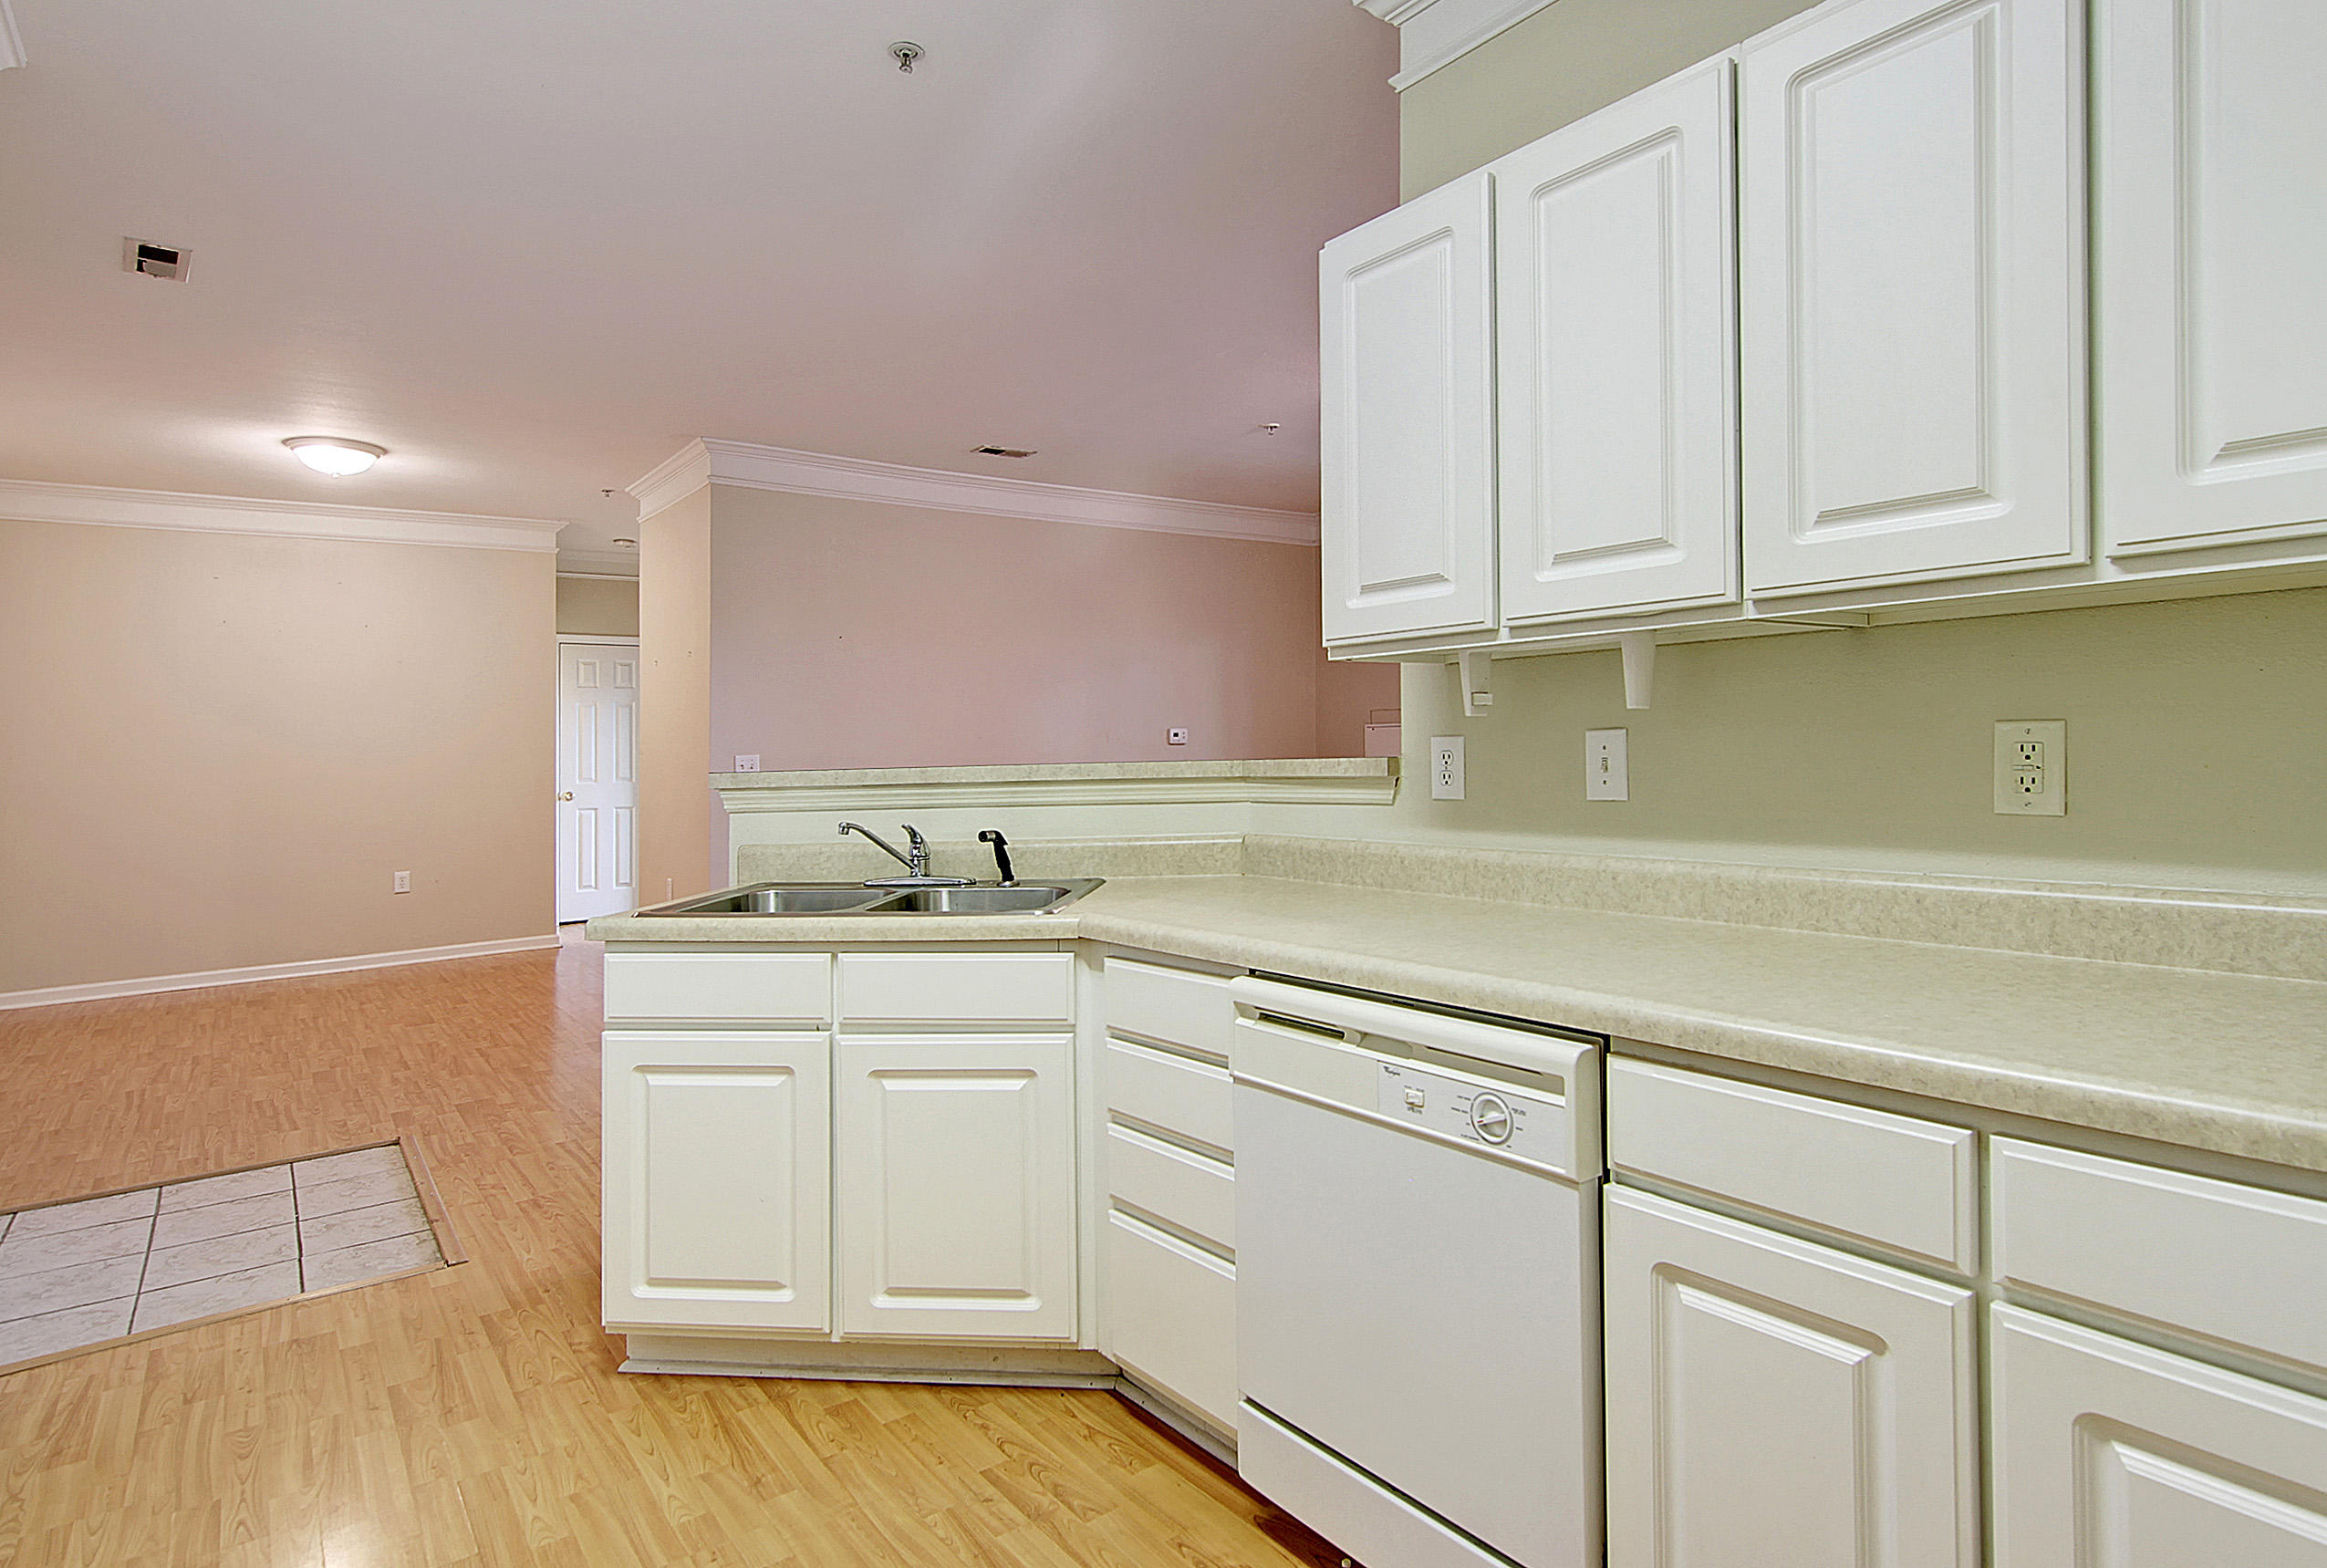 Cambridge Lakes Homes For Sale - 1445 Cambridge Lakes, Mount Pleasant, SC - 4